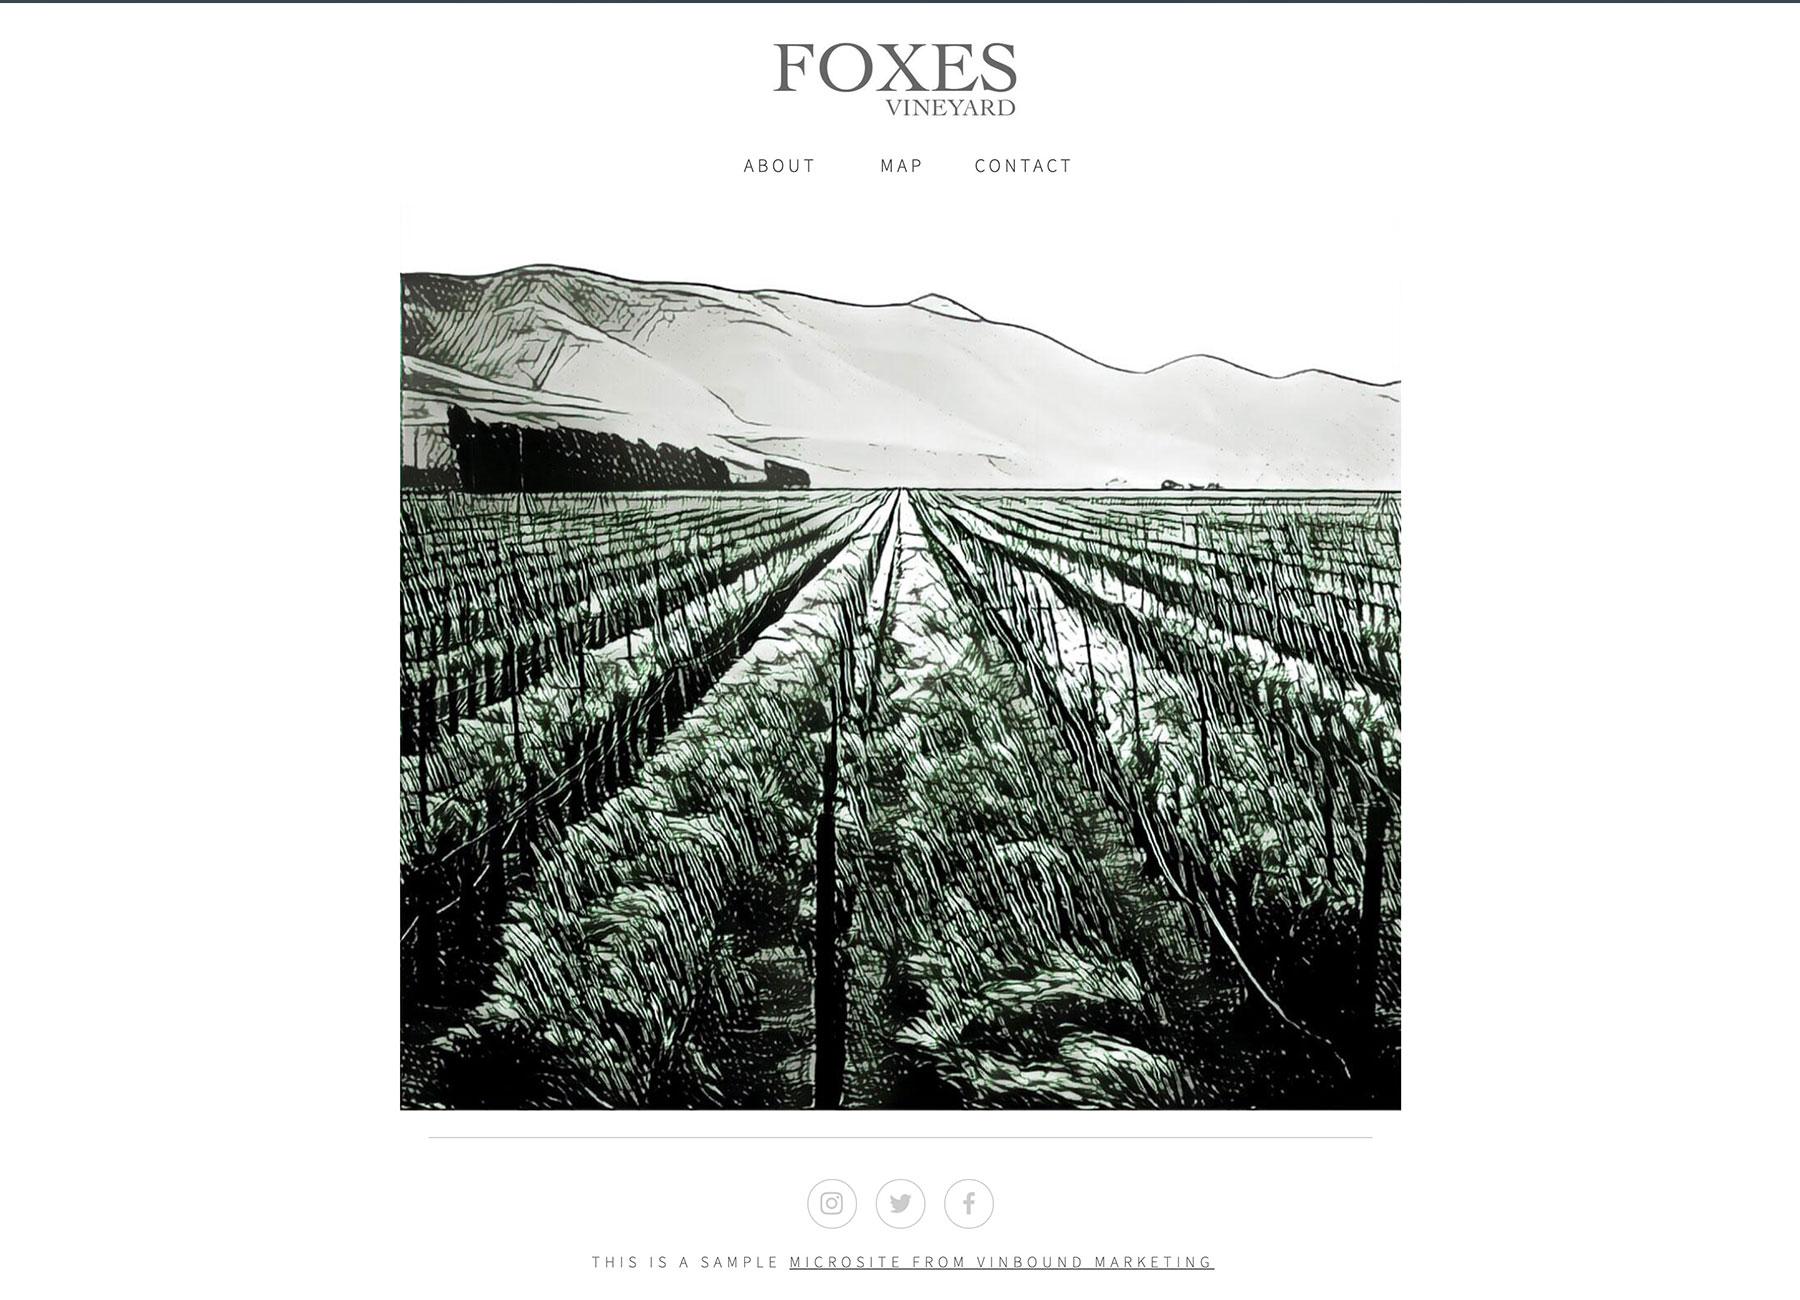 Foxes Vineyard Microsite example